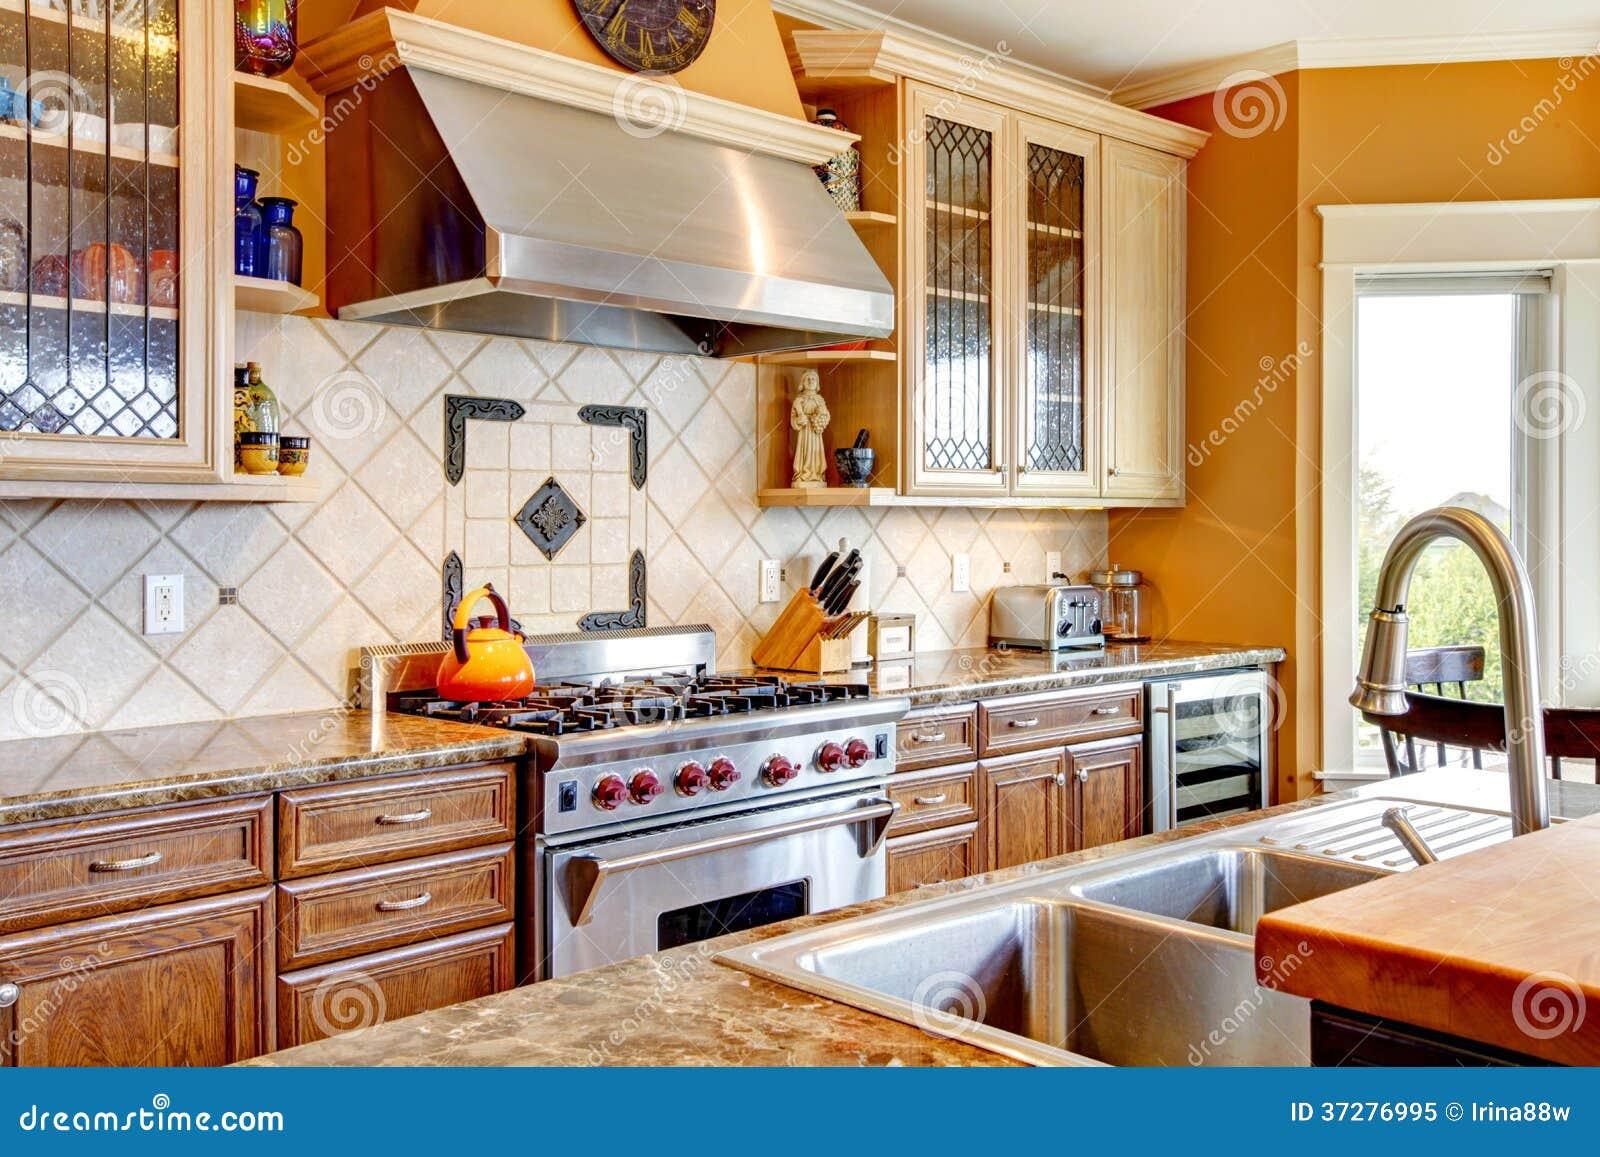 Wood Kitchen Room With Decorated Tile Backsplash Royalty Free